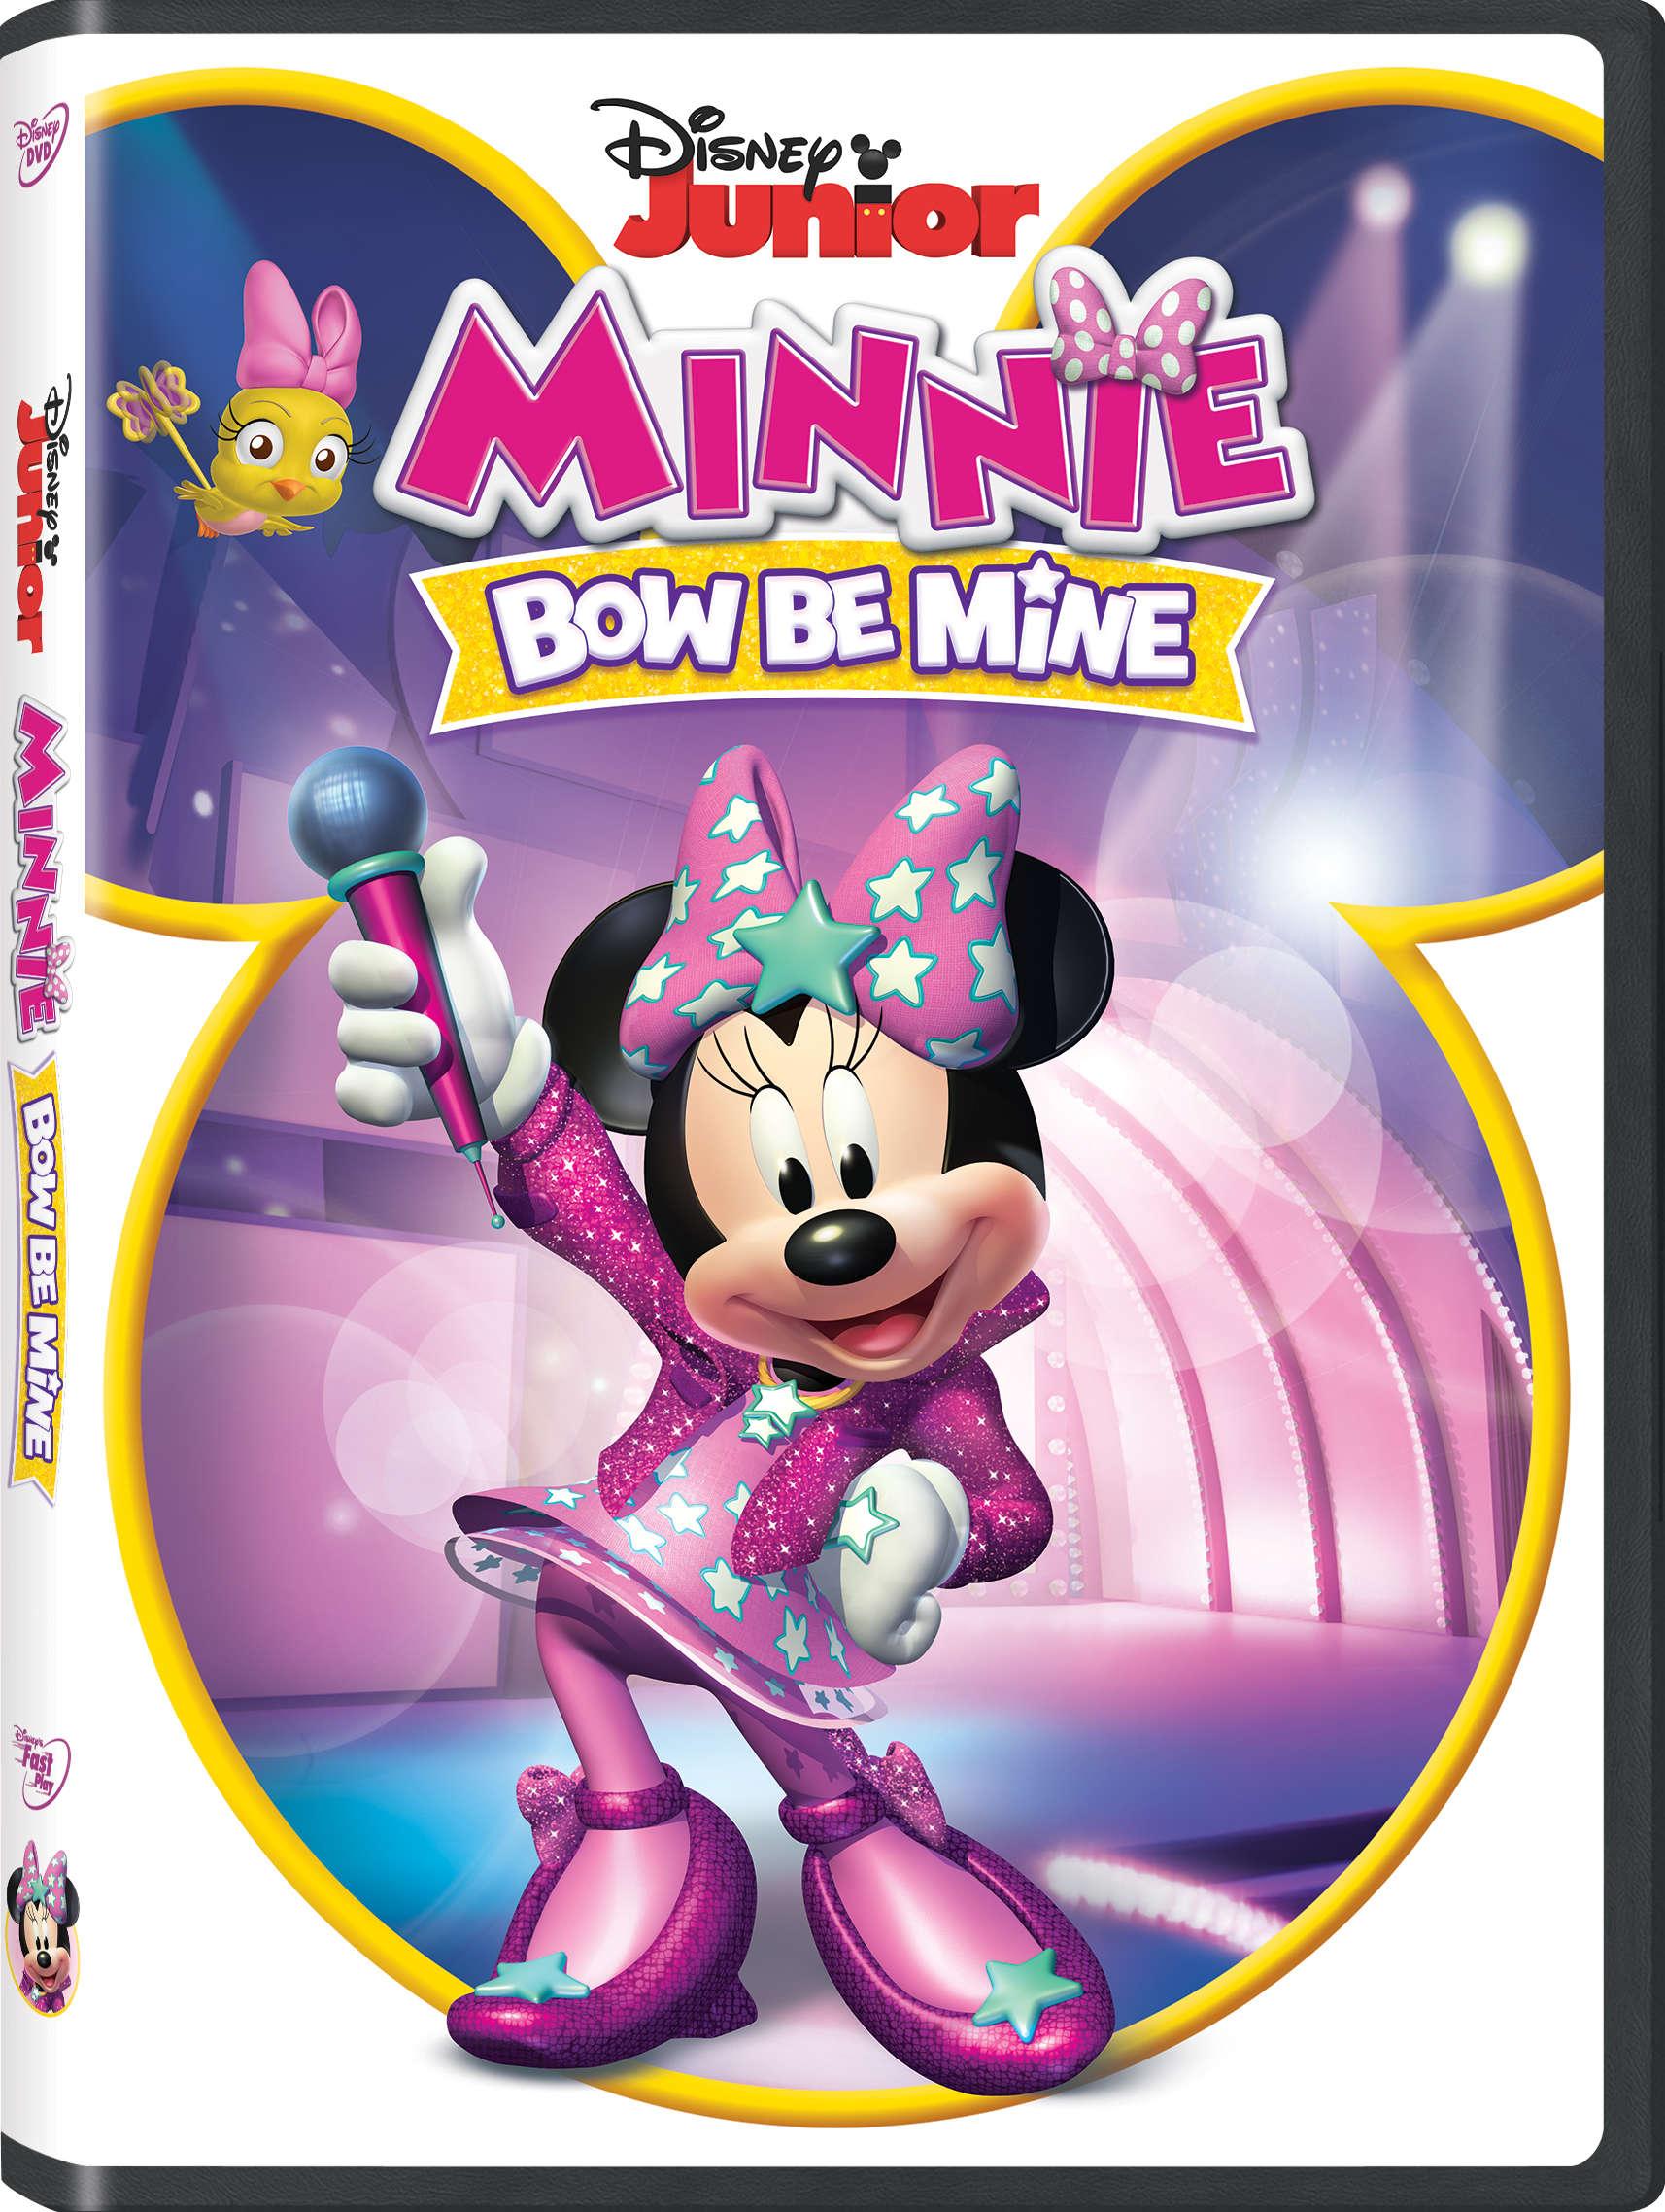 Disney Minnie Bow Be Mine Blu-Ray Giveaway: Enter Now!